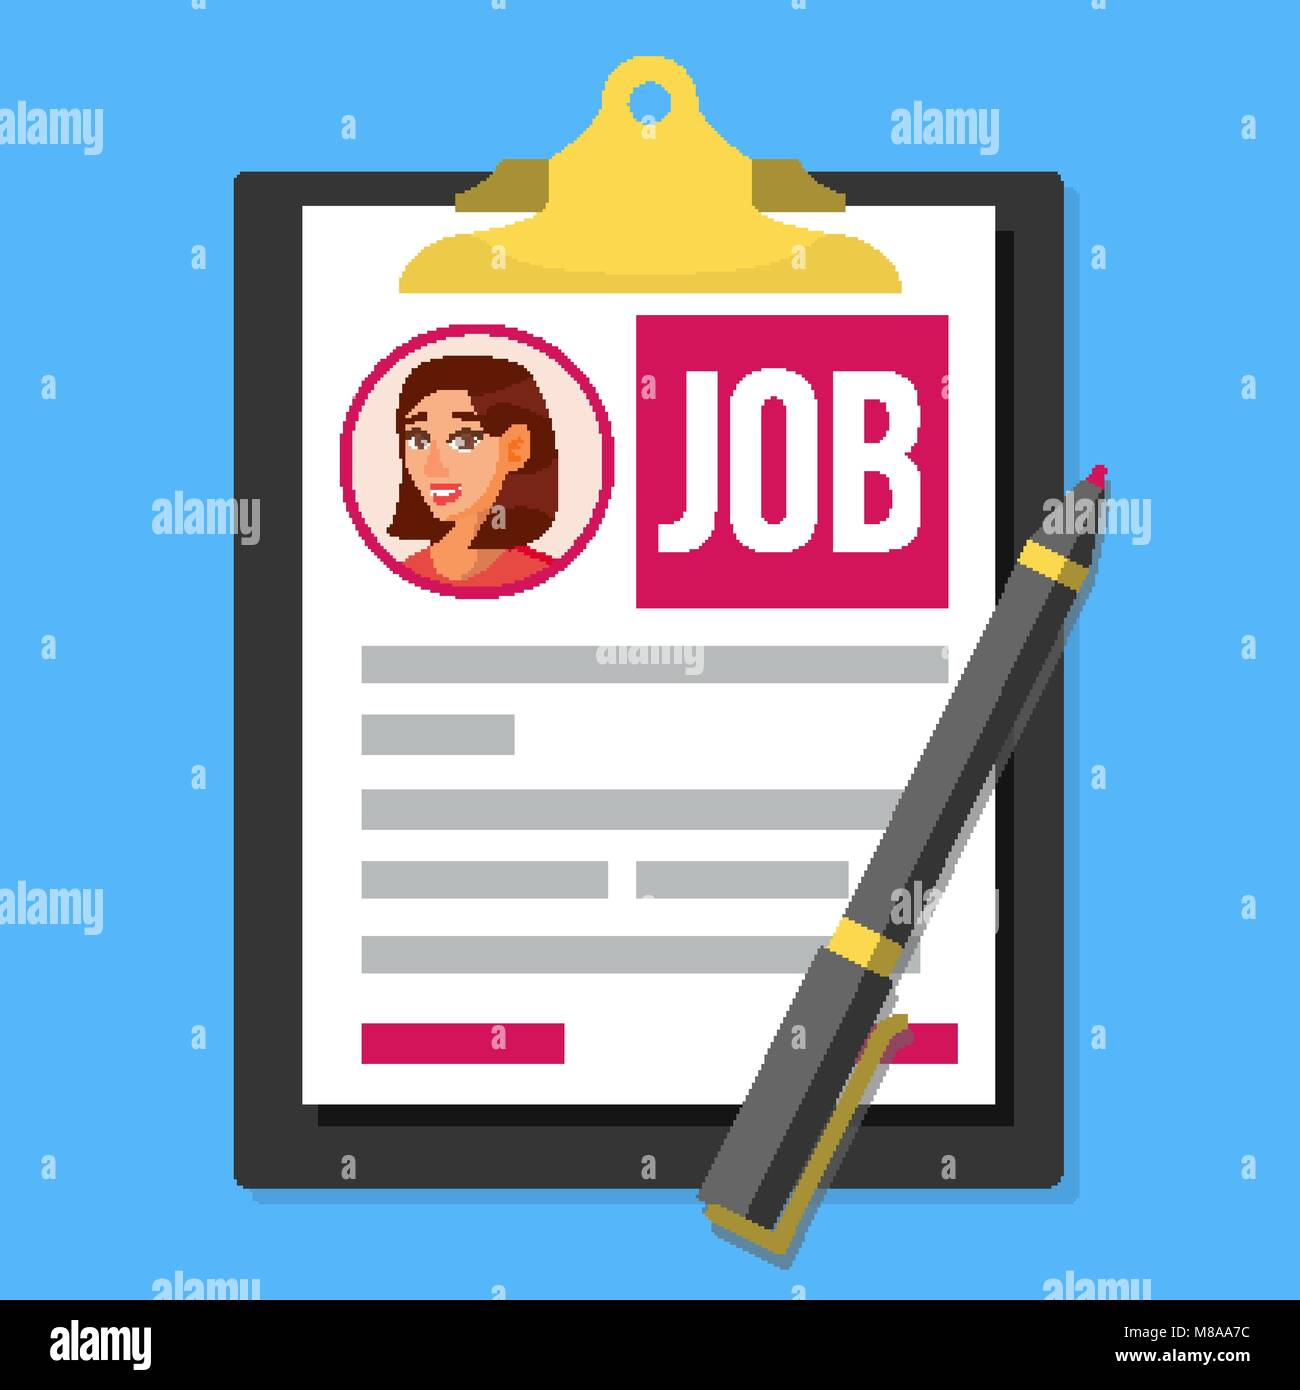 u of c job application